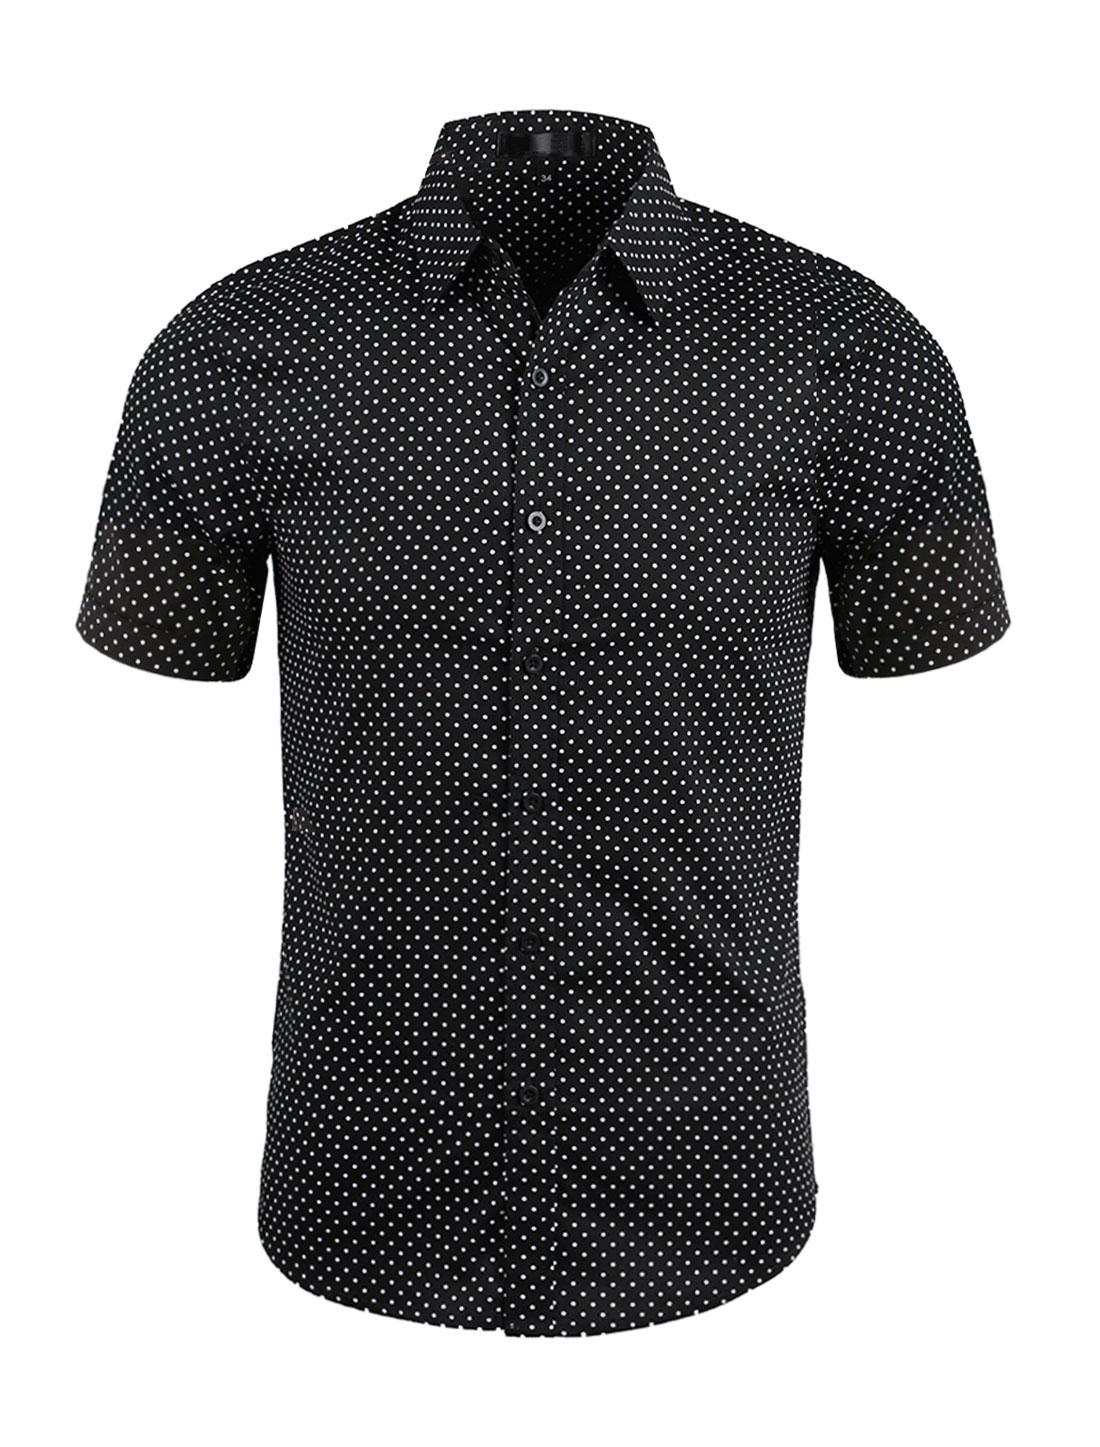 Men Dots Point Collar Short Sleeves Button Down Shirt Black S